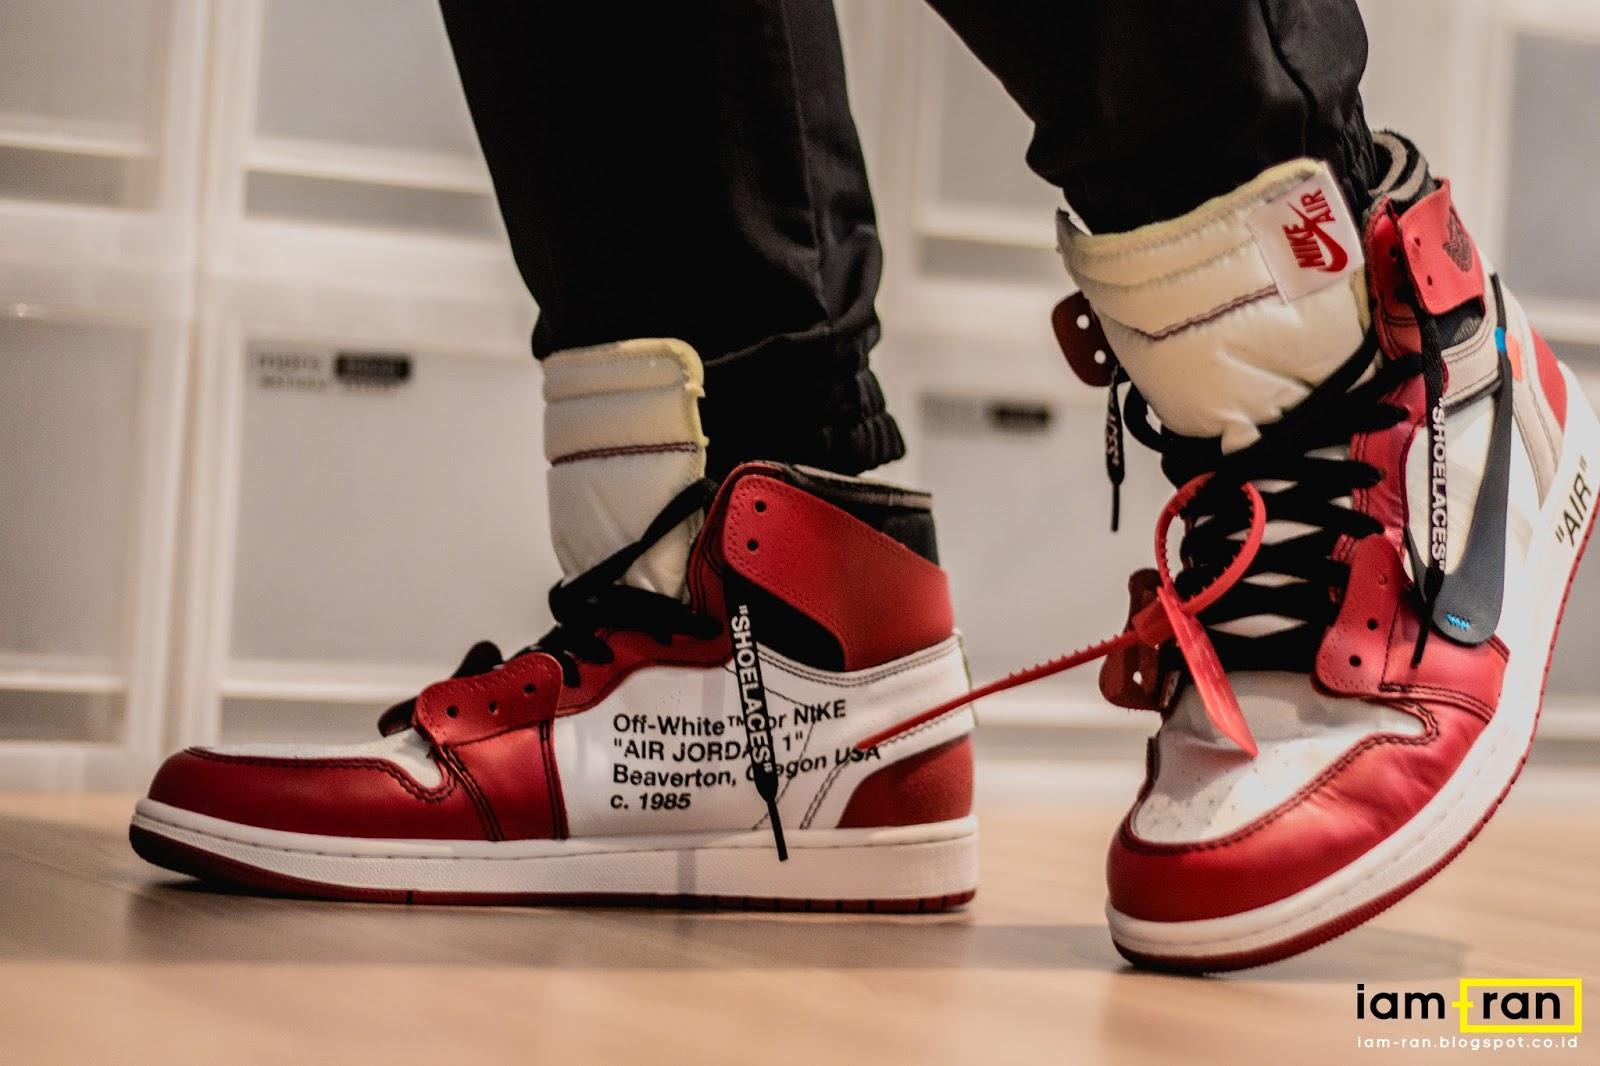 02cbe7b68c68 IAM-RAN  ON FEET   Dipsky - Nike Air Jordan 1 X Off White